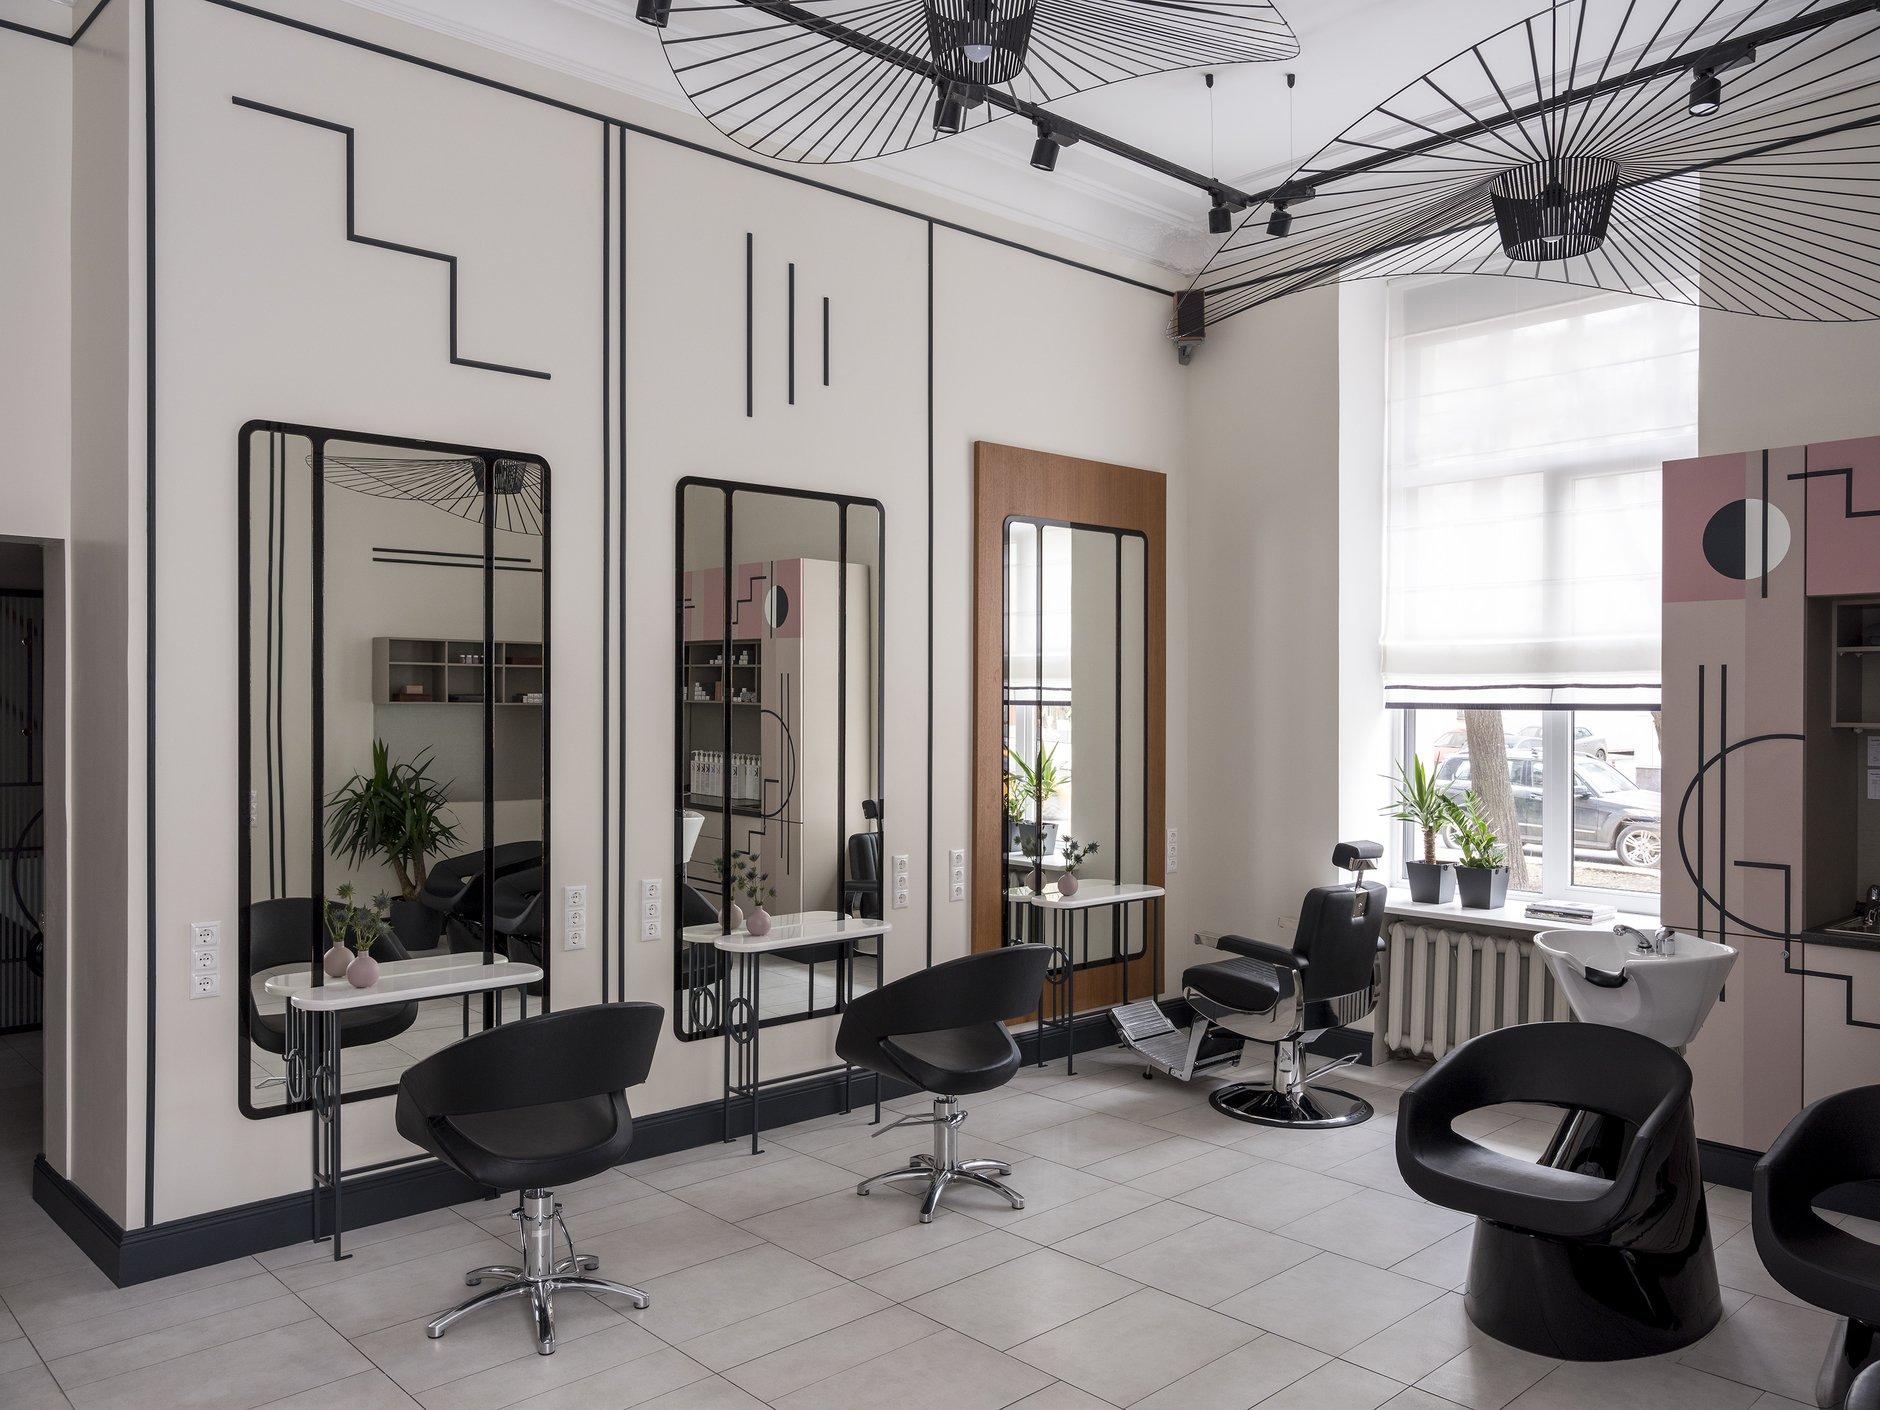 Салон красоты с клиентской базой